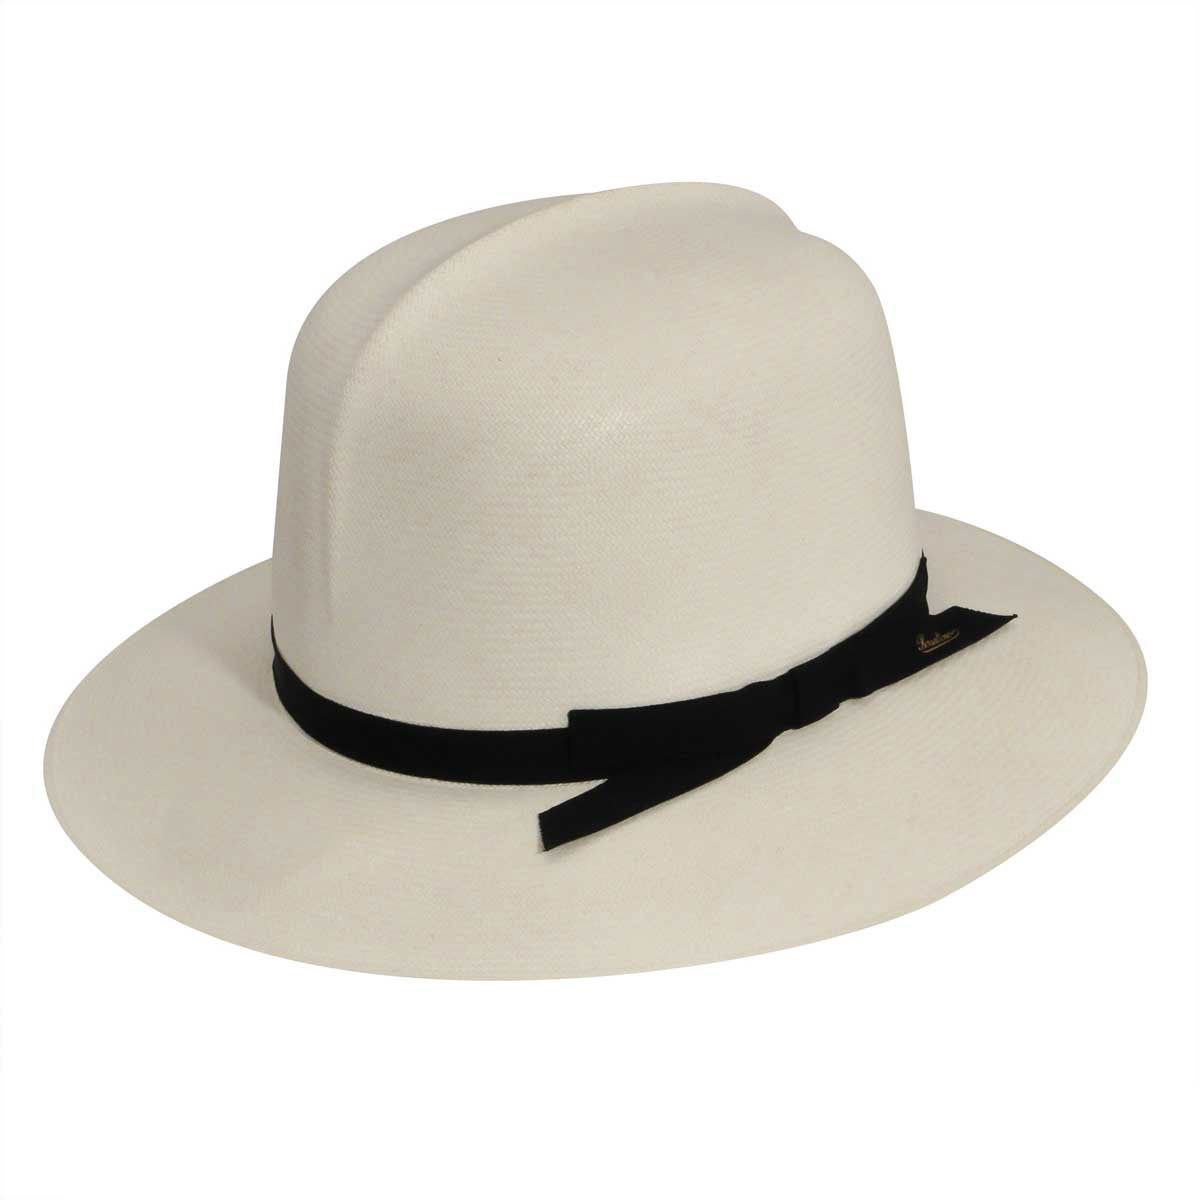 Mens 1920s Style Hats and Caps Montecristi Panama Fedora $617.00 AT vintagedancer.com